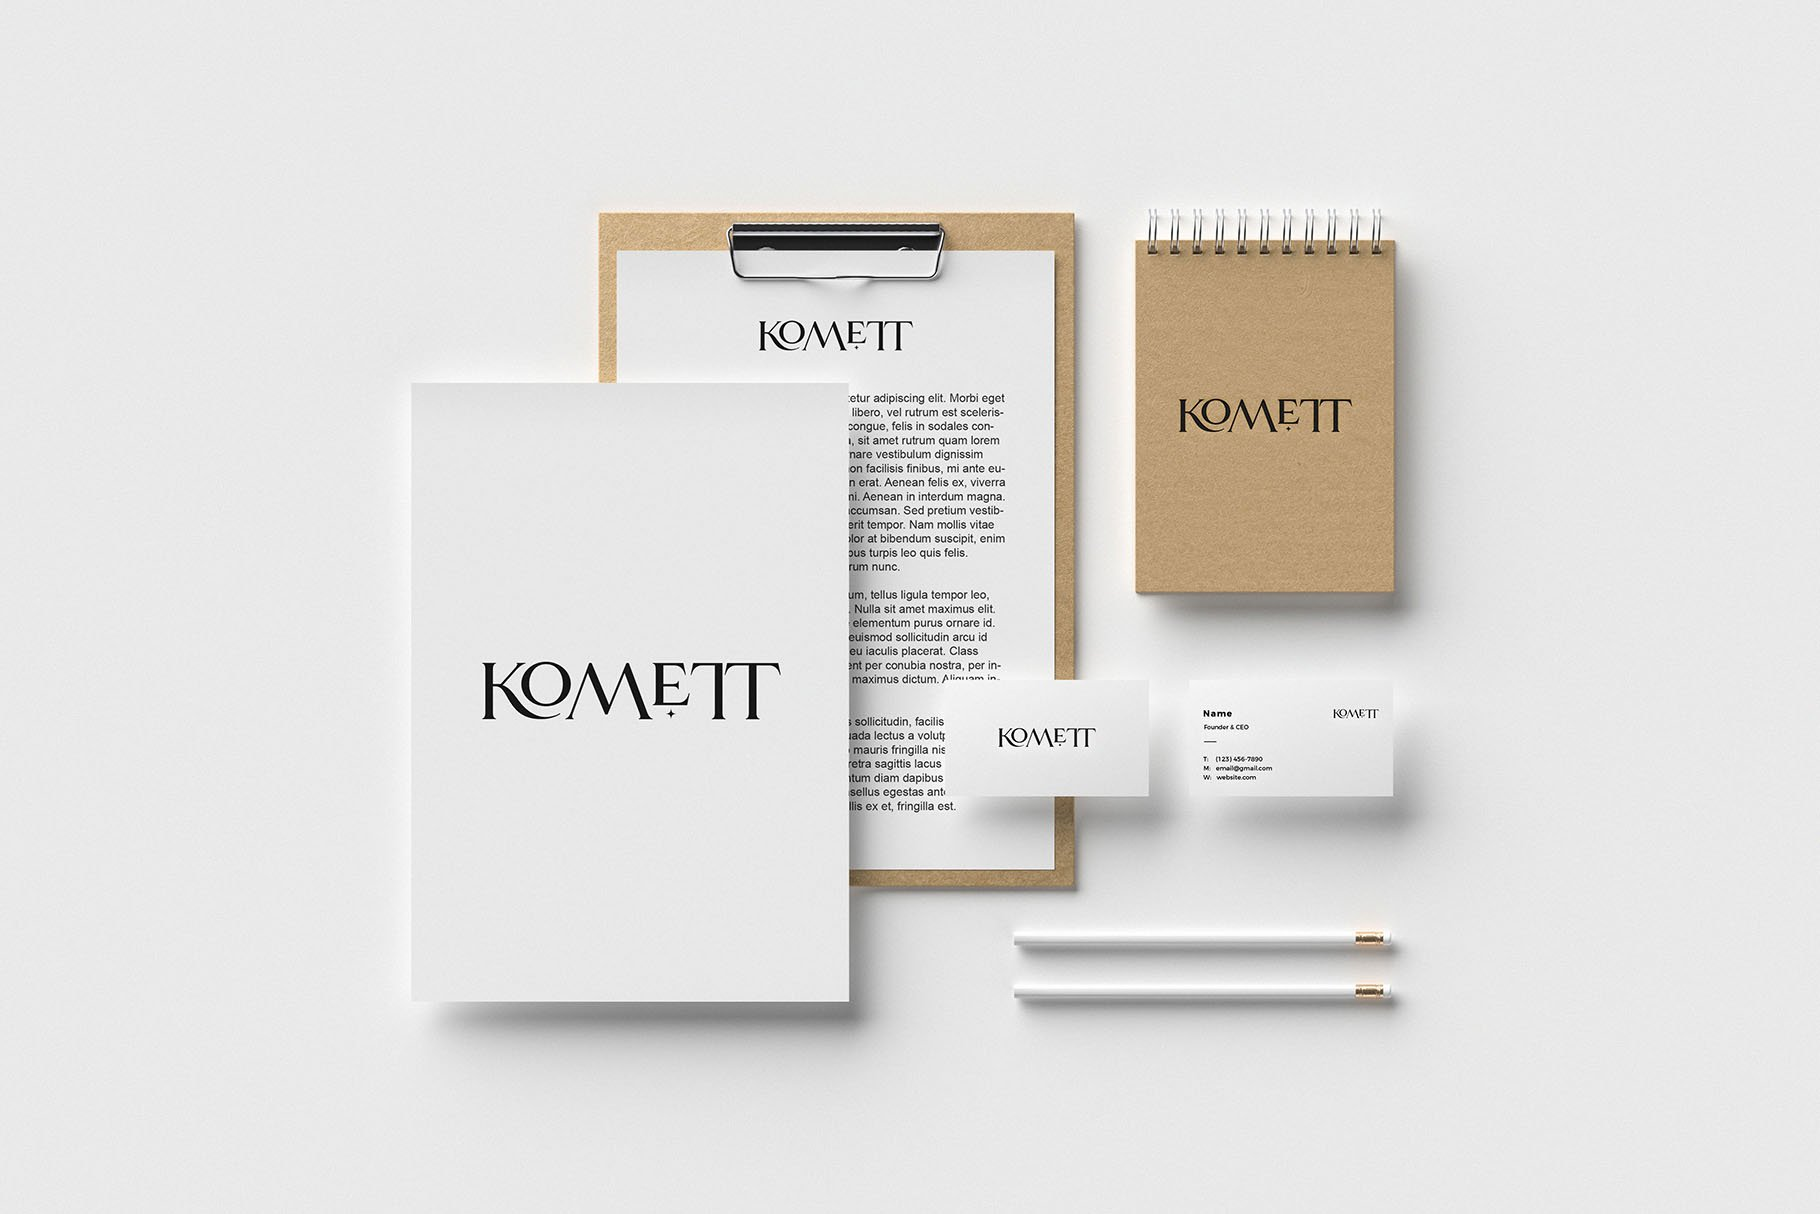 ligatures ligature font minimalist font display font classy font elegant font serif wedding font modern font logo font fashion social media modern serif 5 7